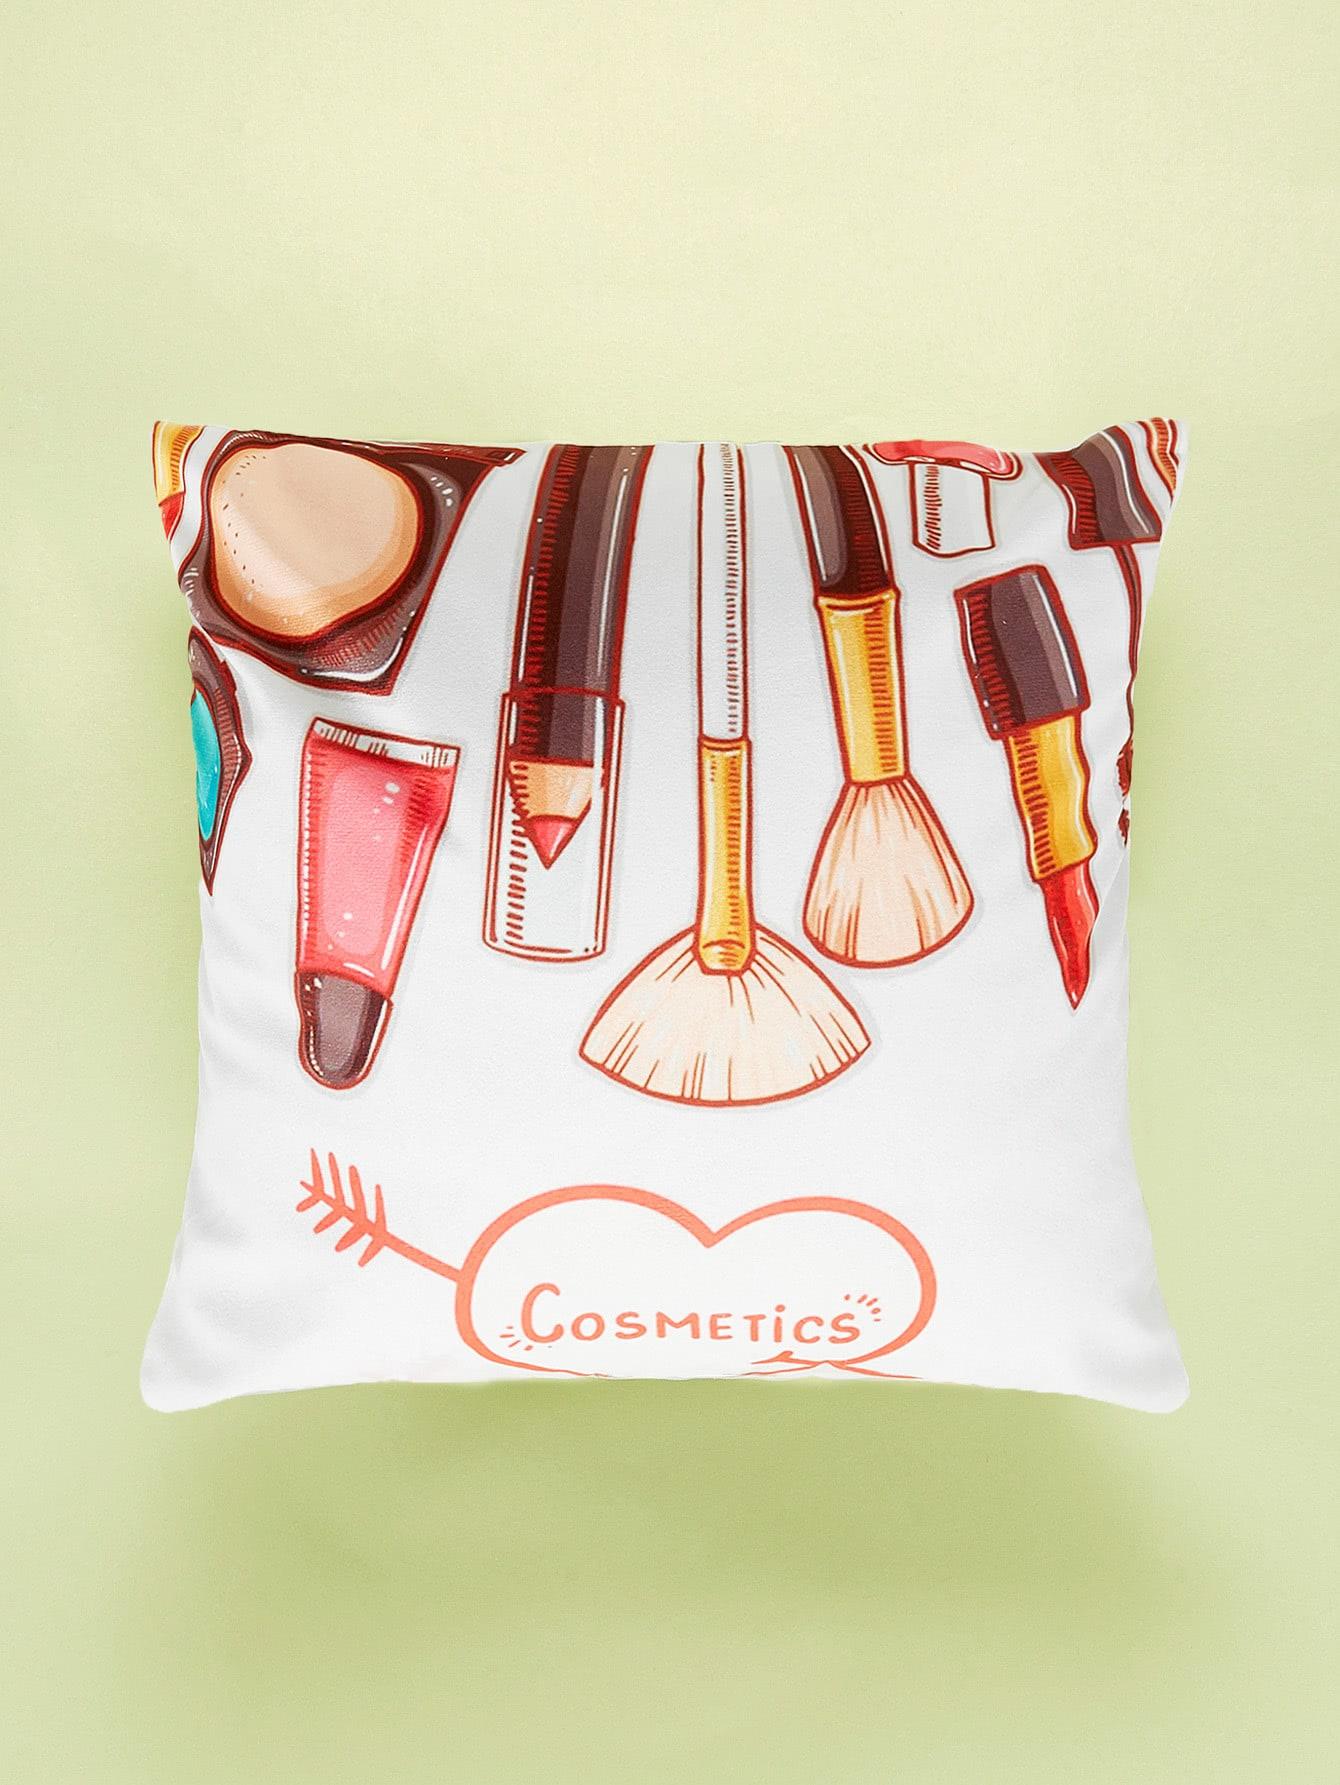 Makeup Tools Print Cushion Cover